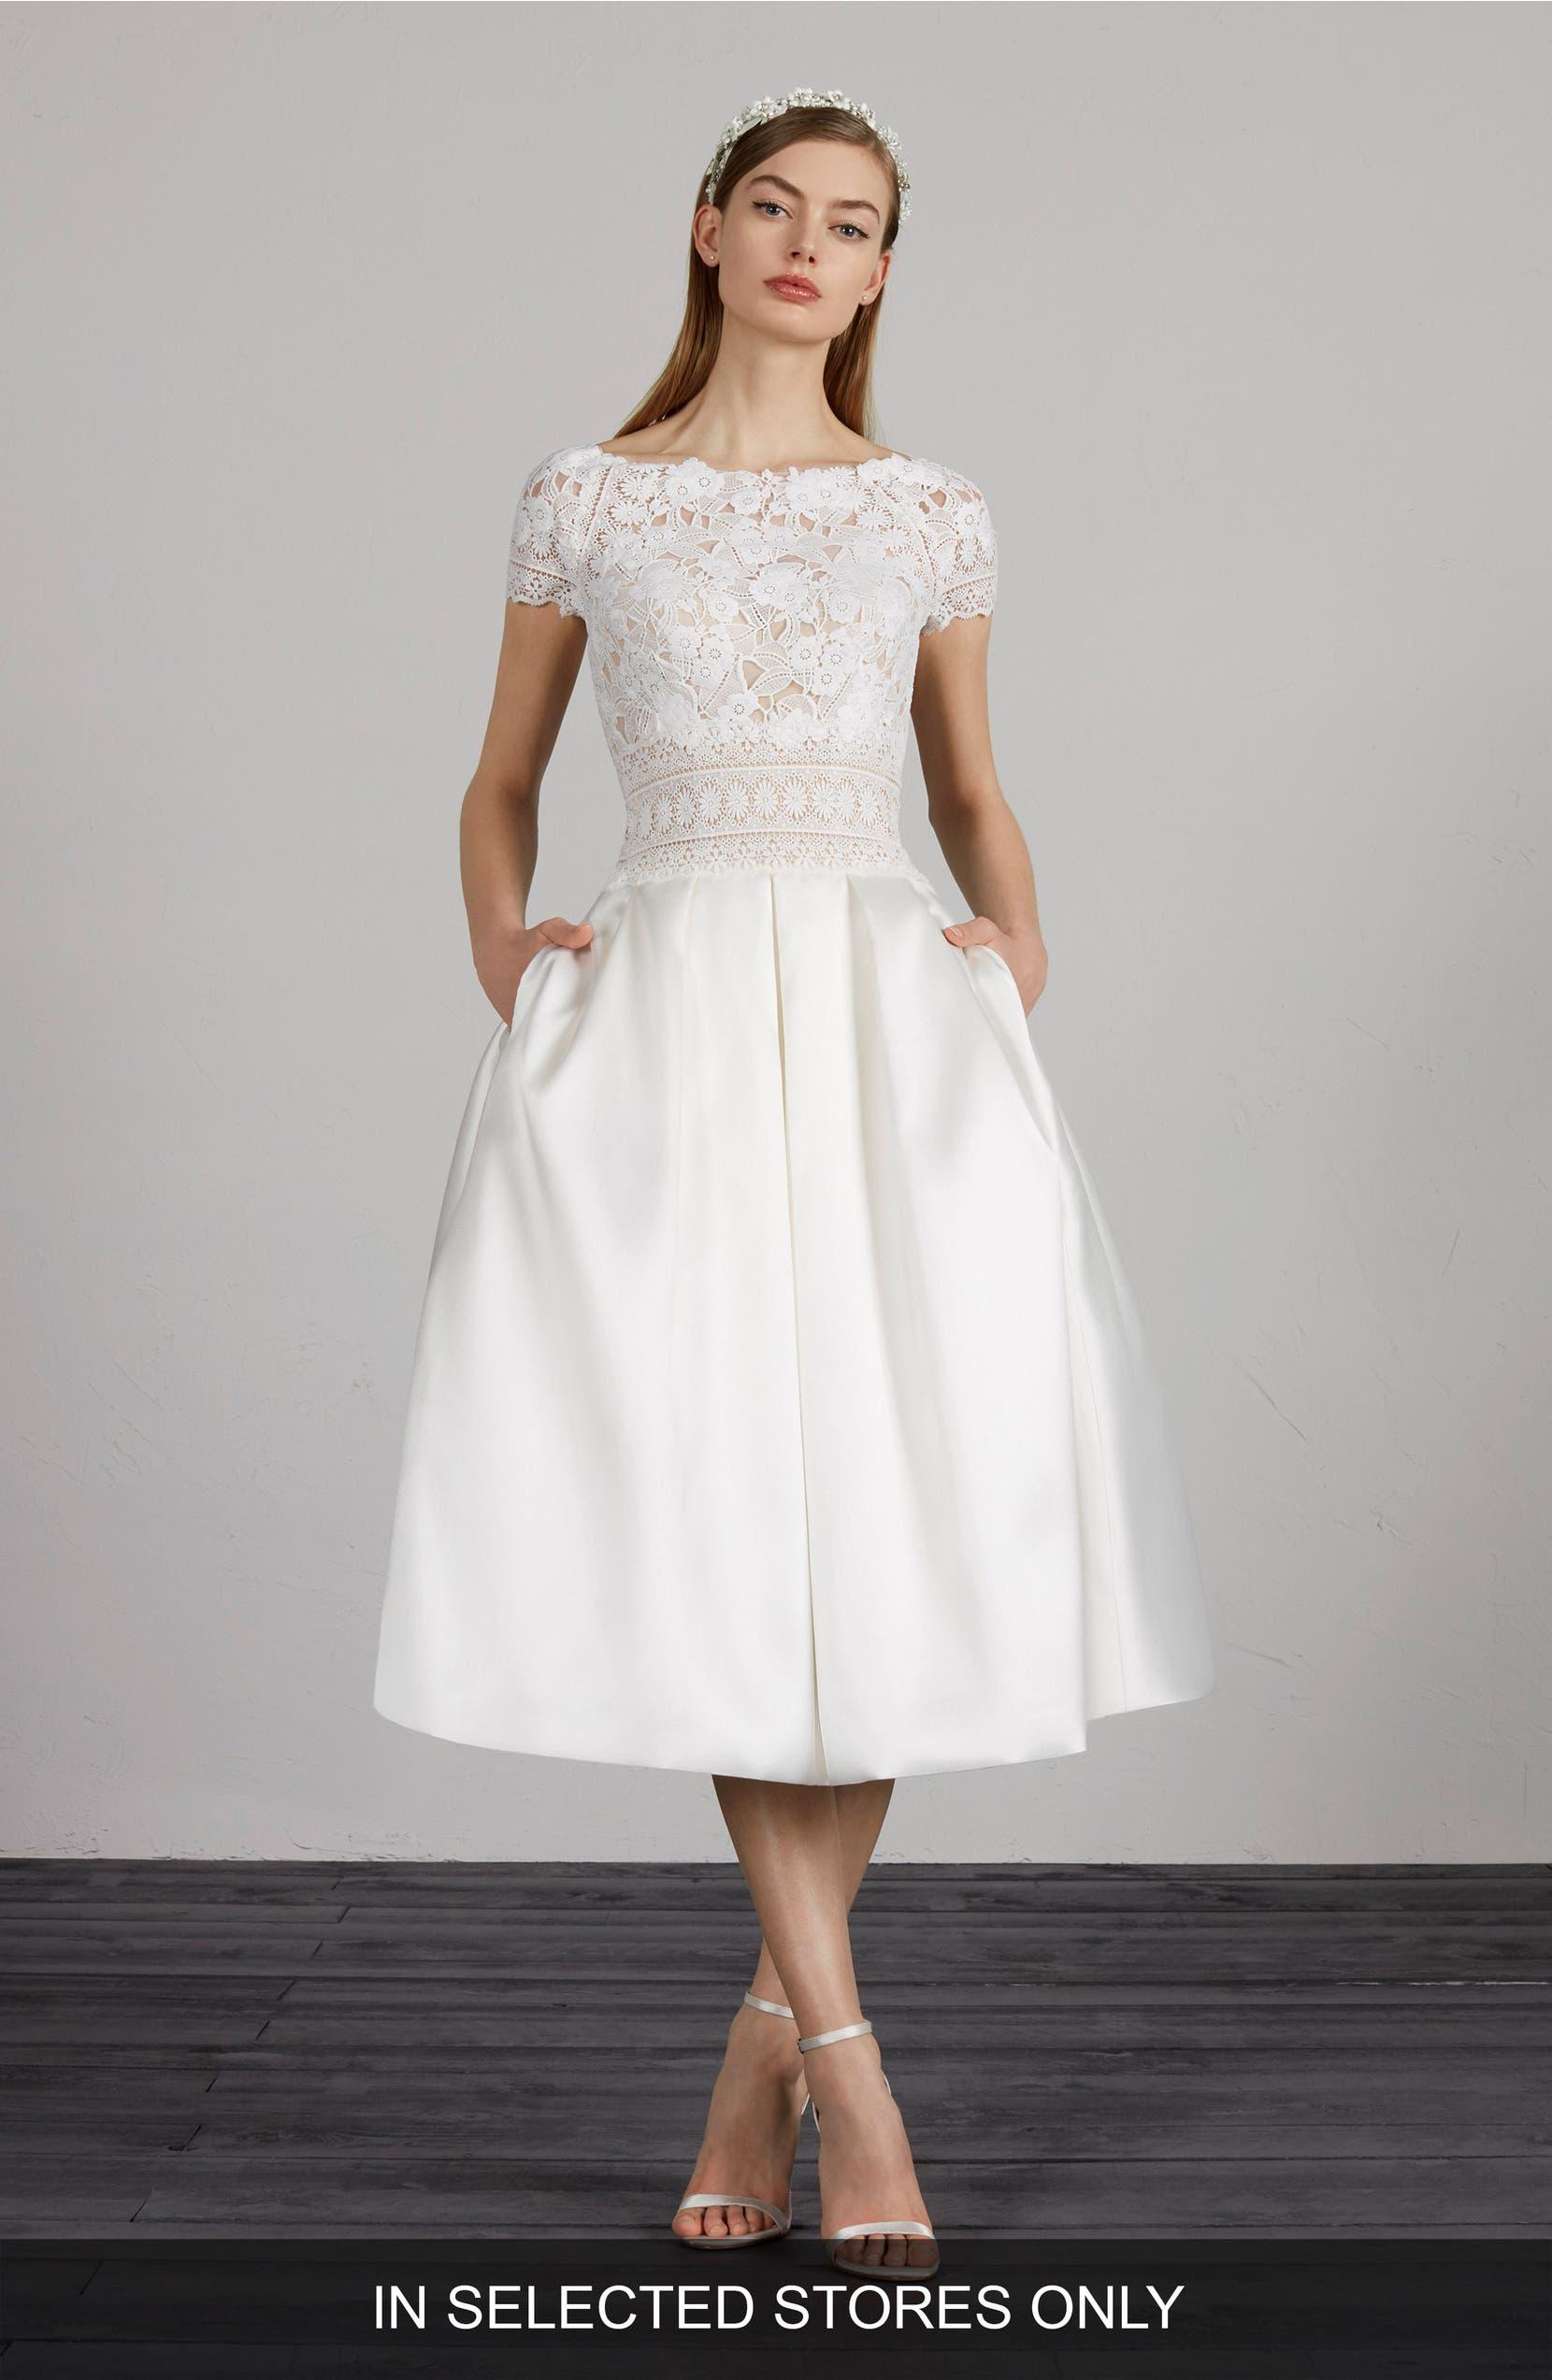 720ef32d5b970 Pronovias Miami Lace & Mikado Tea Length Dress | Nordstrom